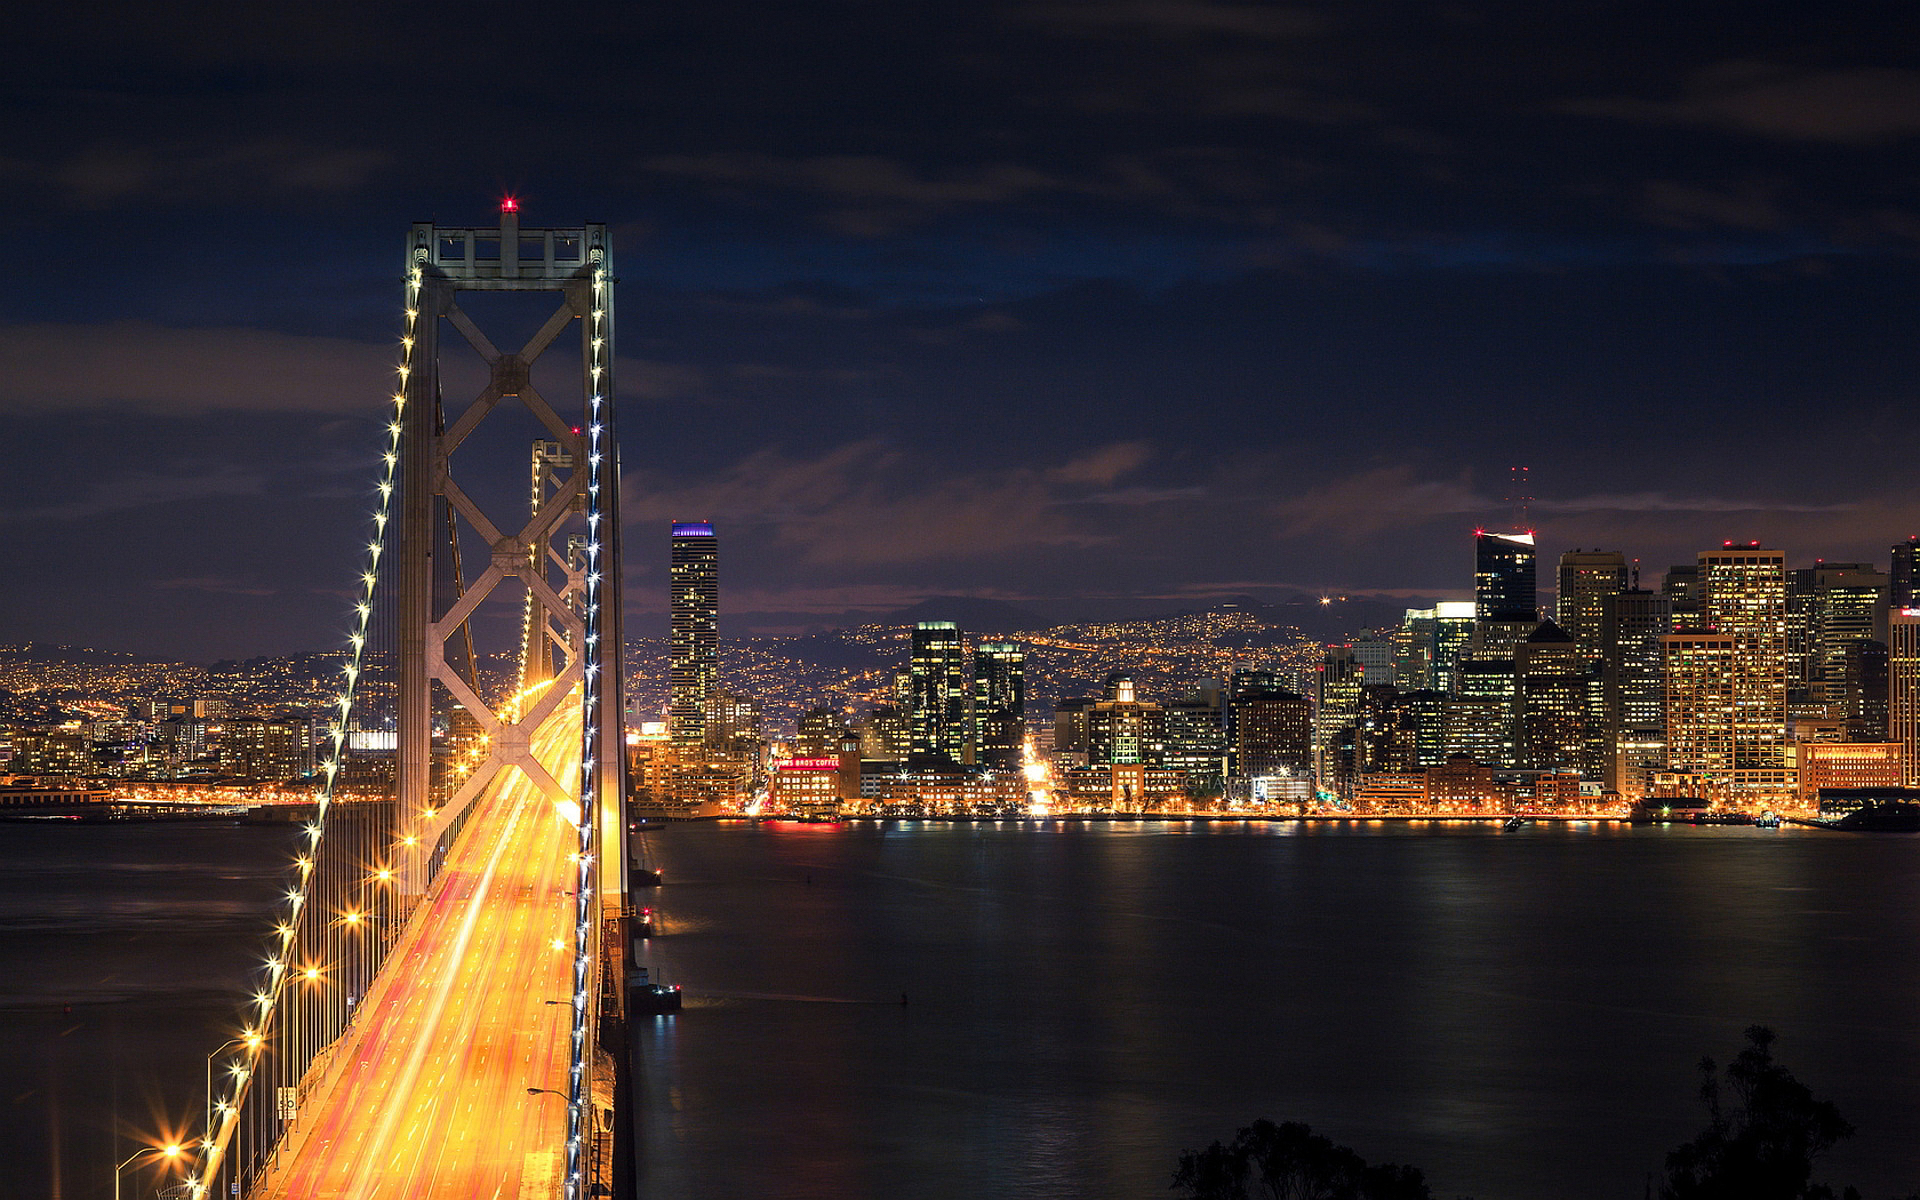 Night of San Francisco